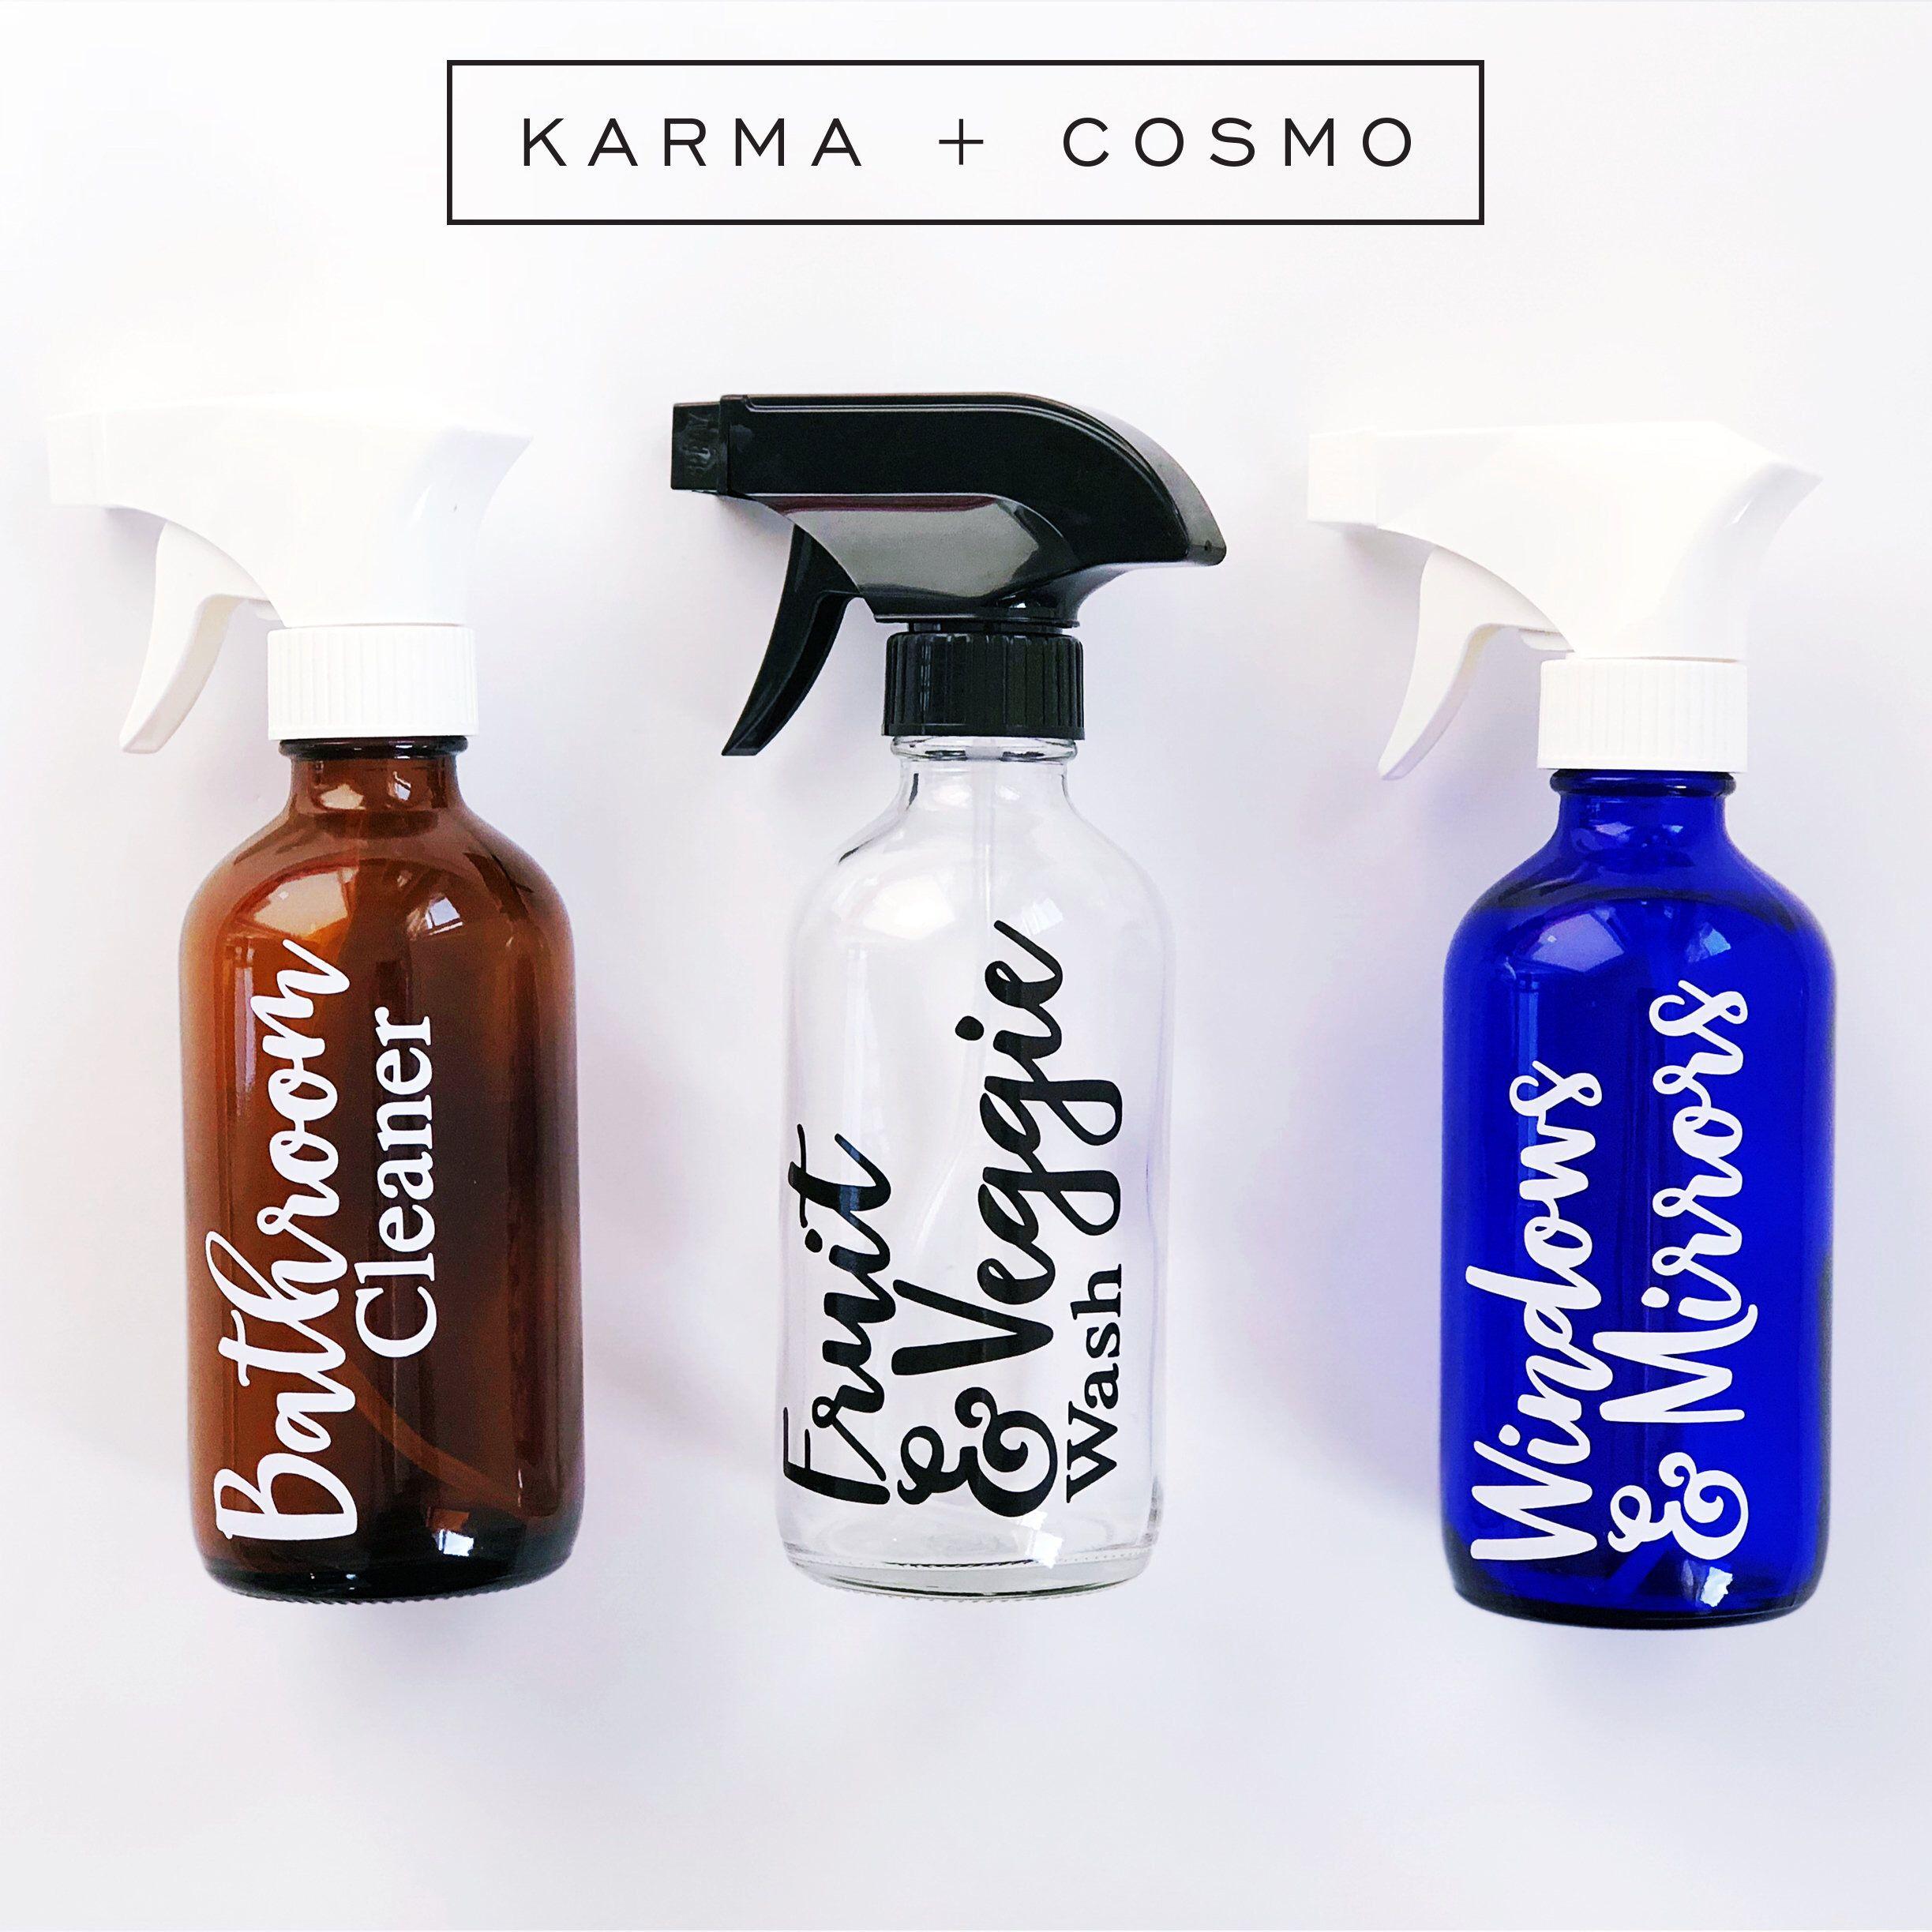 Label Only 1oz 2oz 4oz 8oz 16oz Label For Spray Or Dropper Bottles Customizable Vinyl Labels Bathandbeauty Gla Custom Bottles Dropper Bottles Bottle